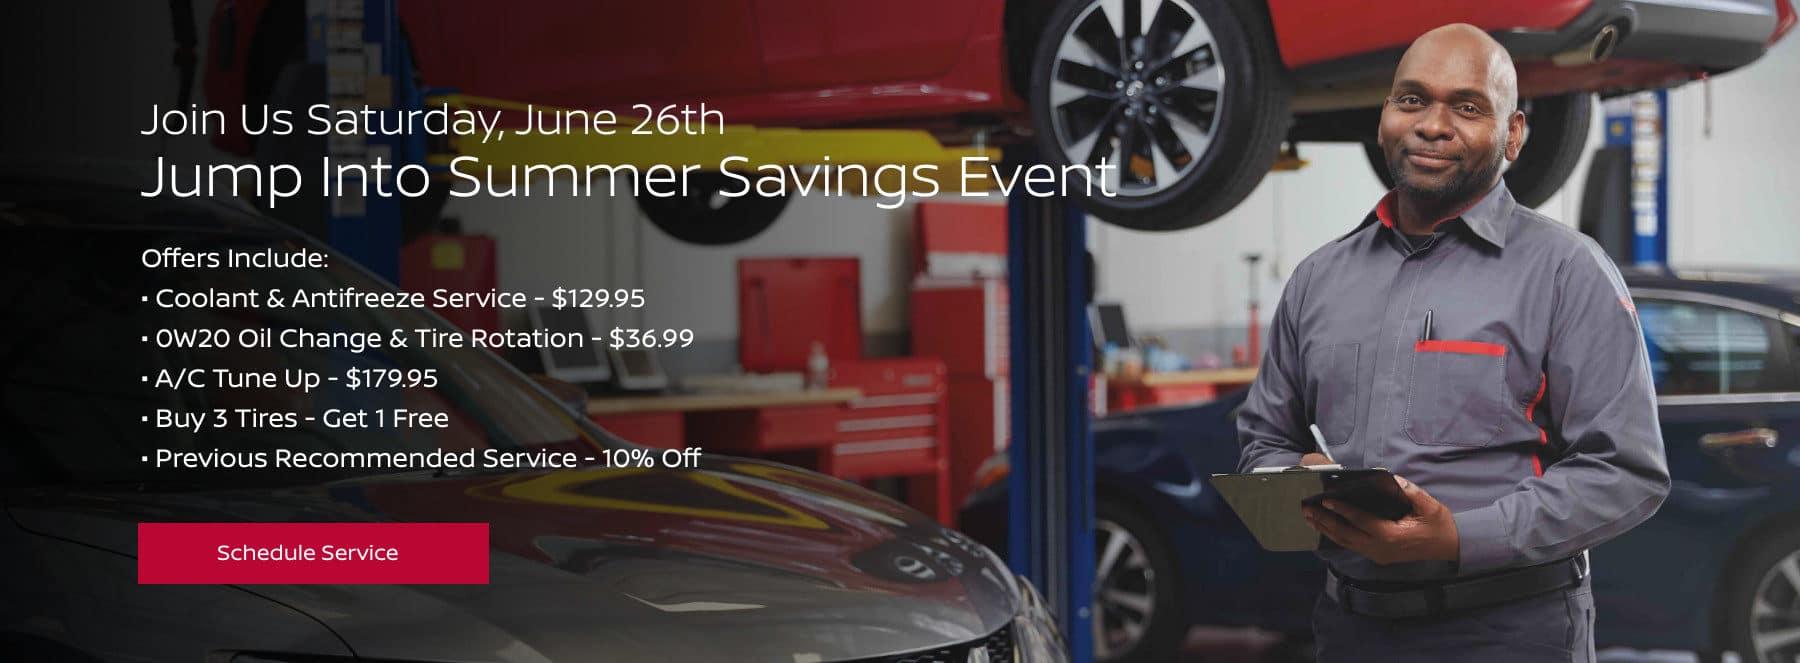 Jump Into Summer Savings Event